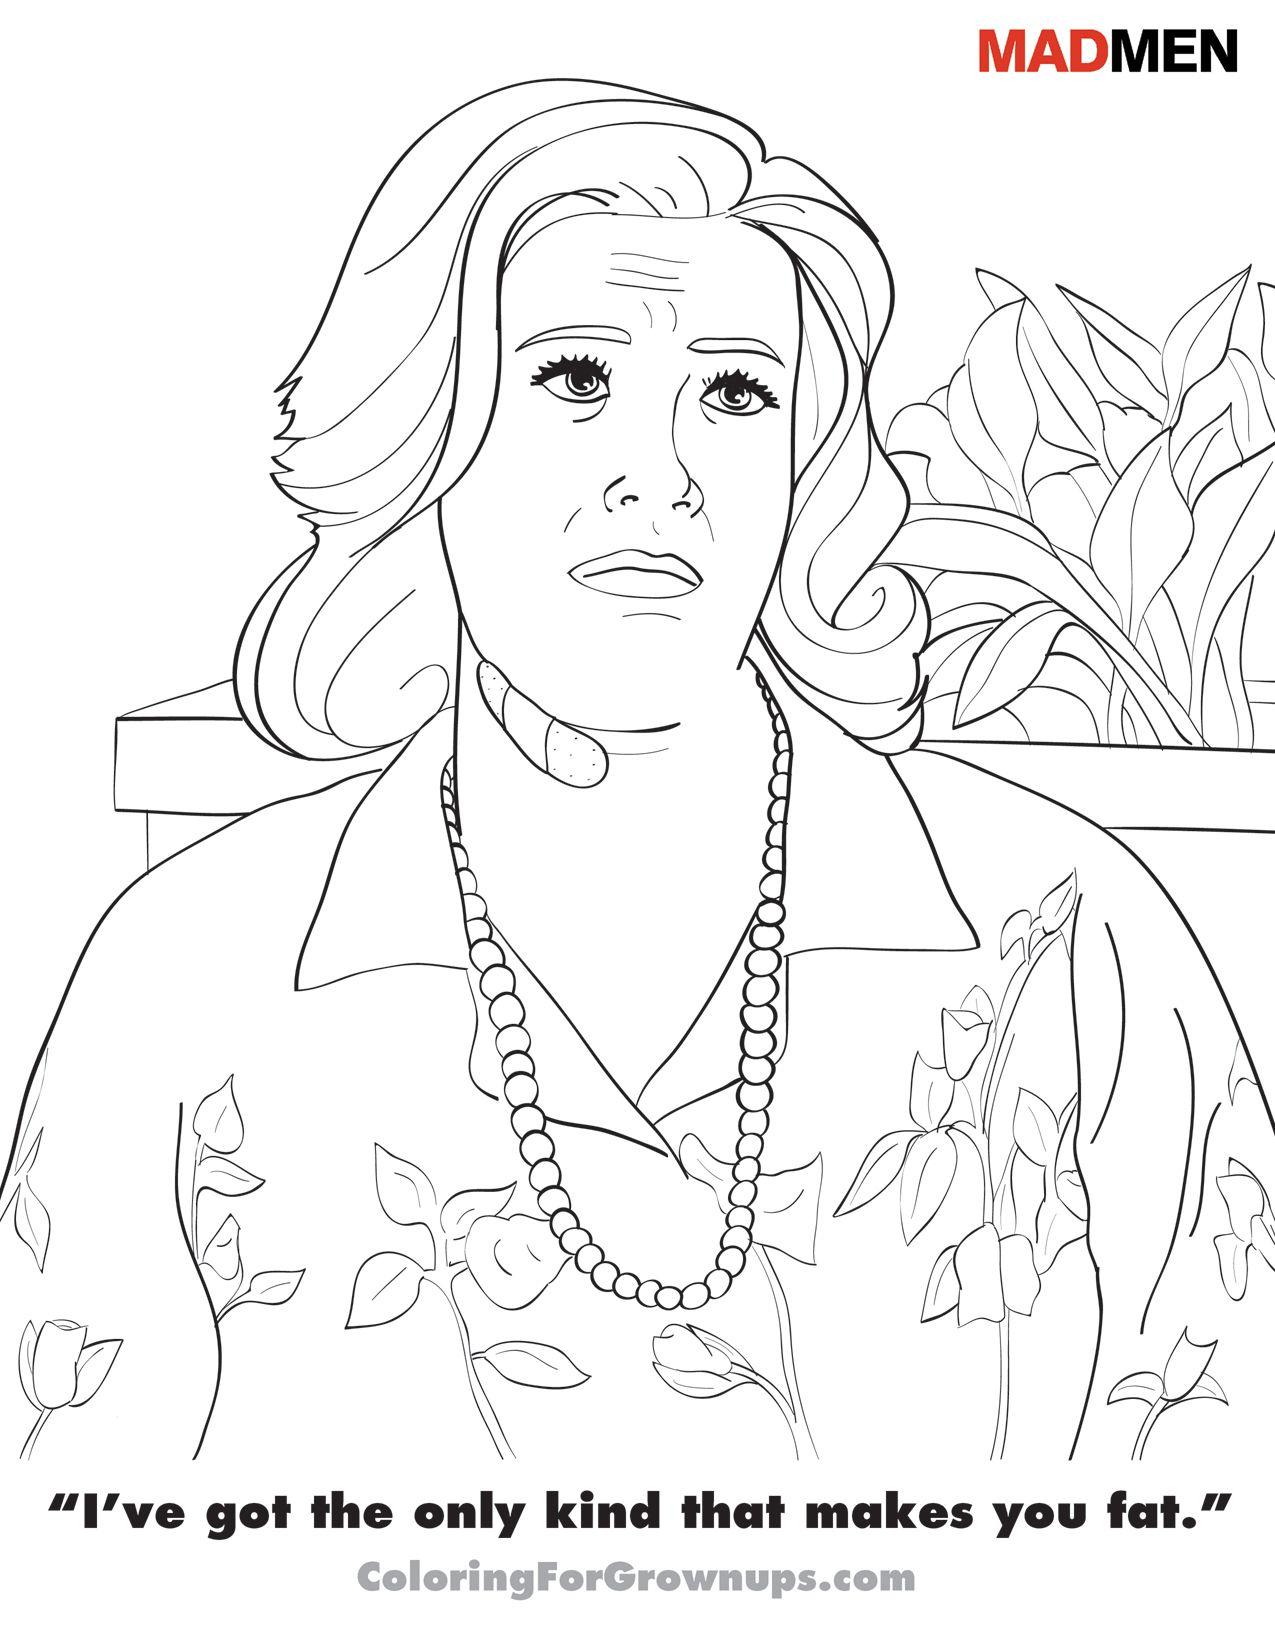 Madmen Coloring Page  (Coloringforgrownups.com)